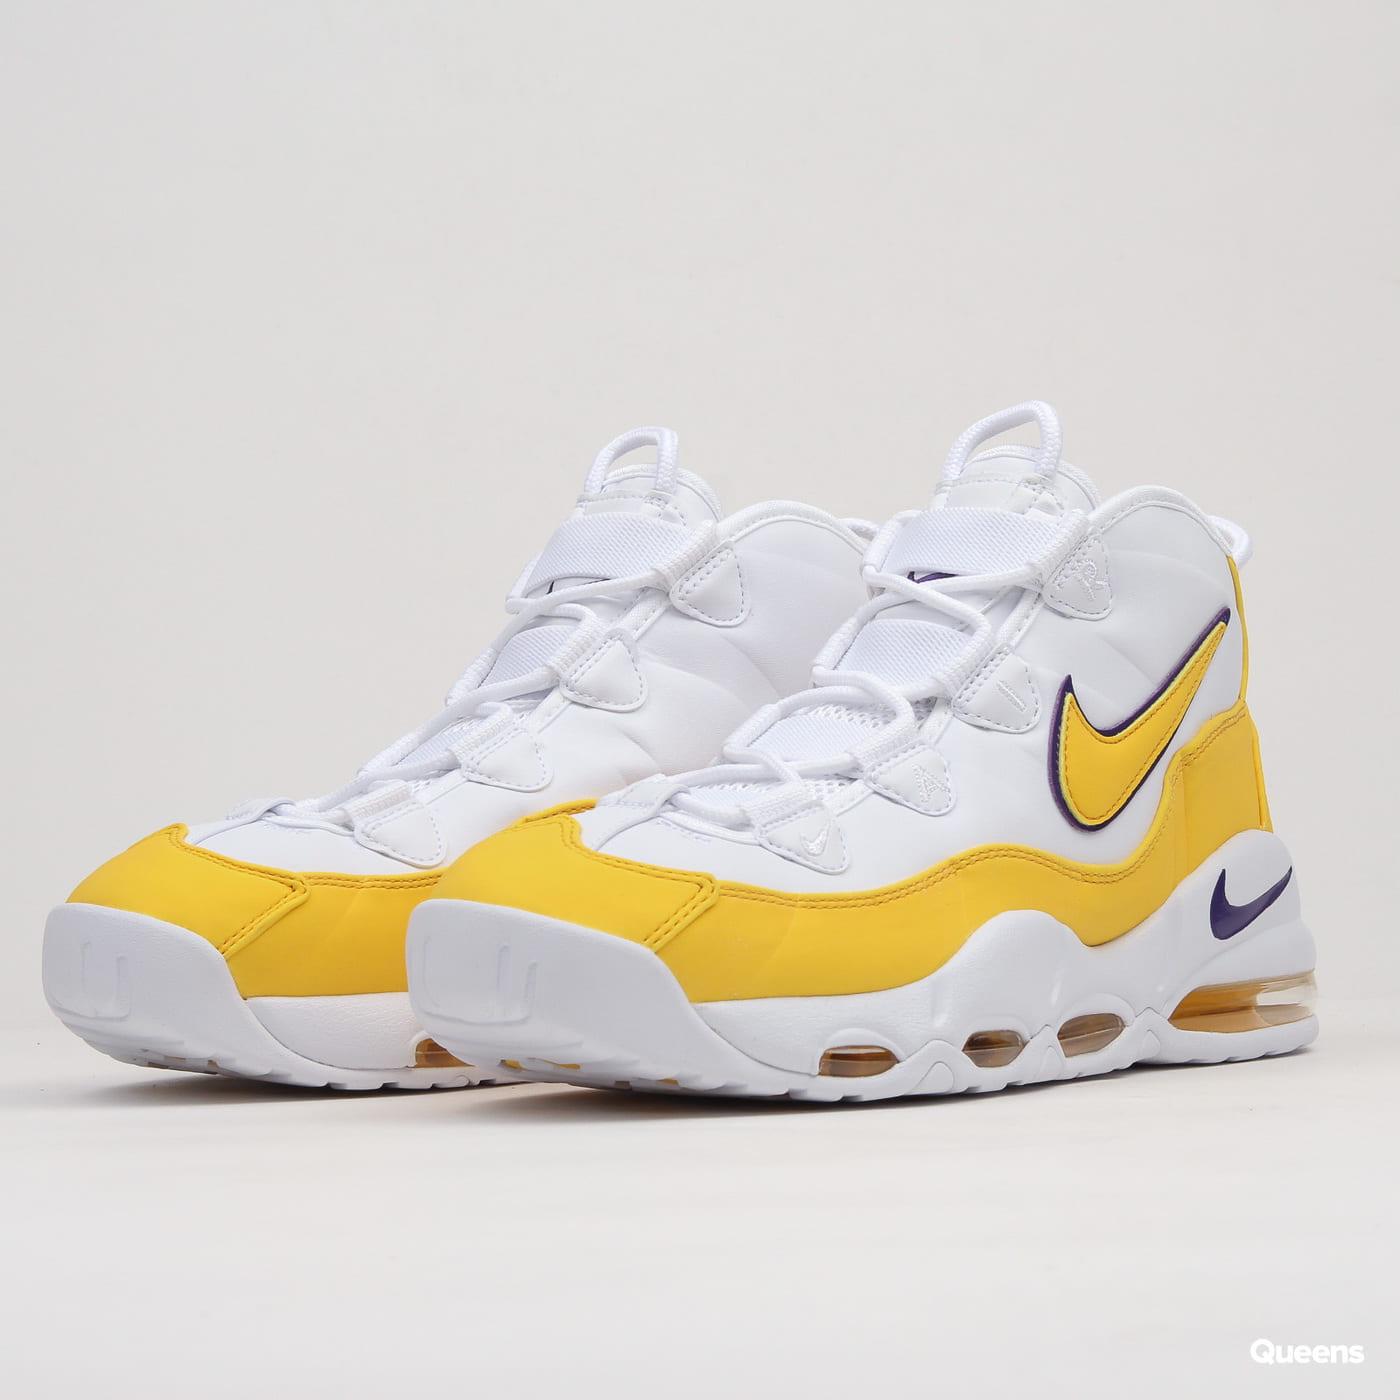 watch e2b6b d2452 Nike Air Max Uptempo '95 white / amarillo - court purple